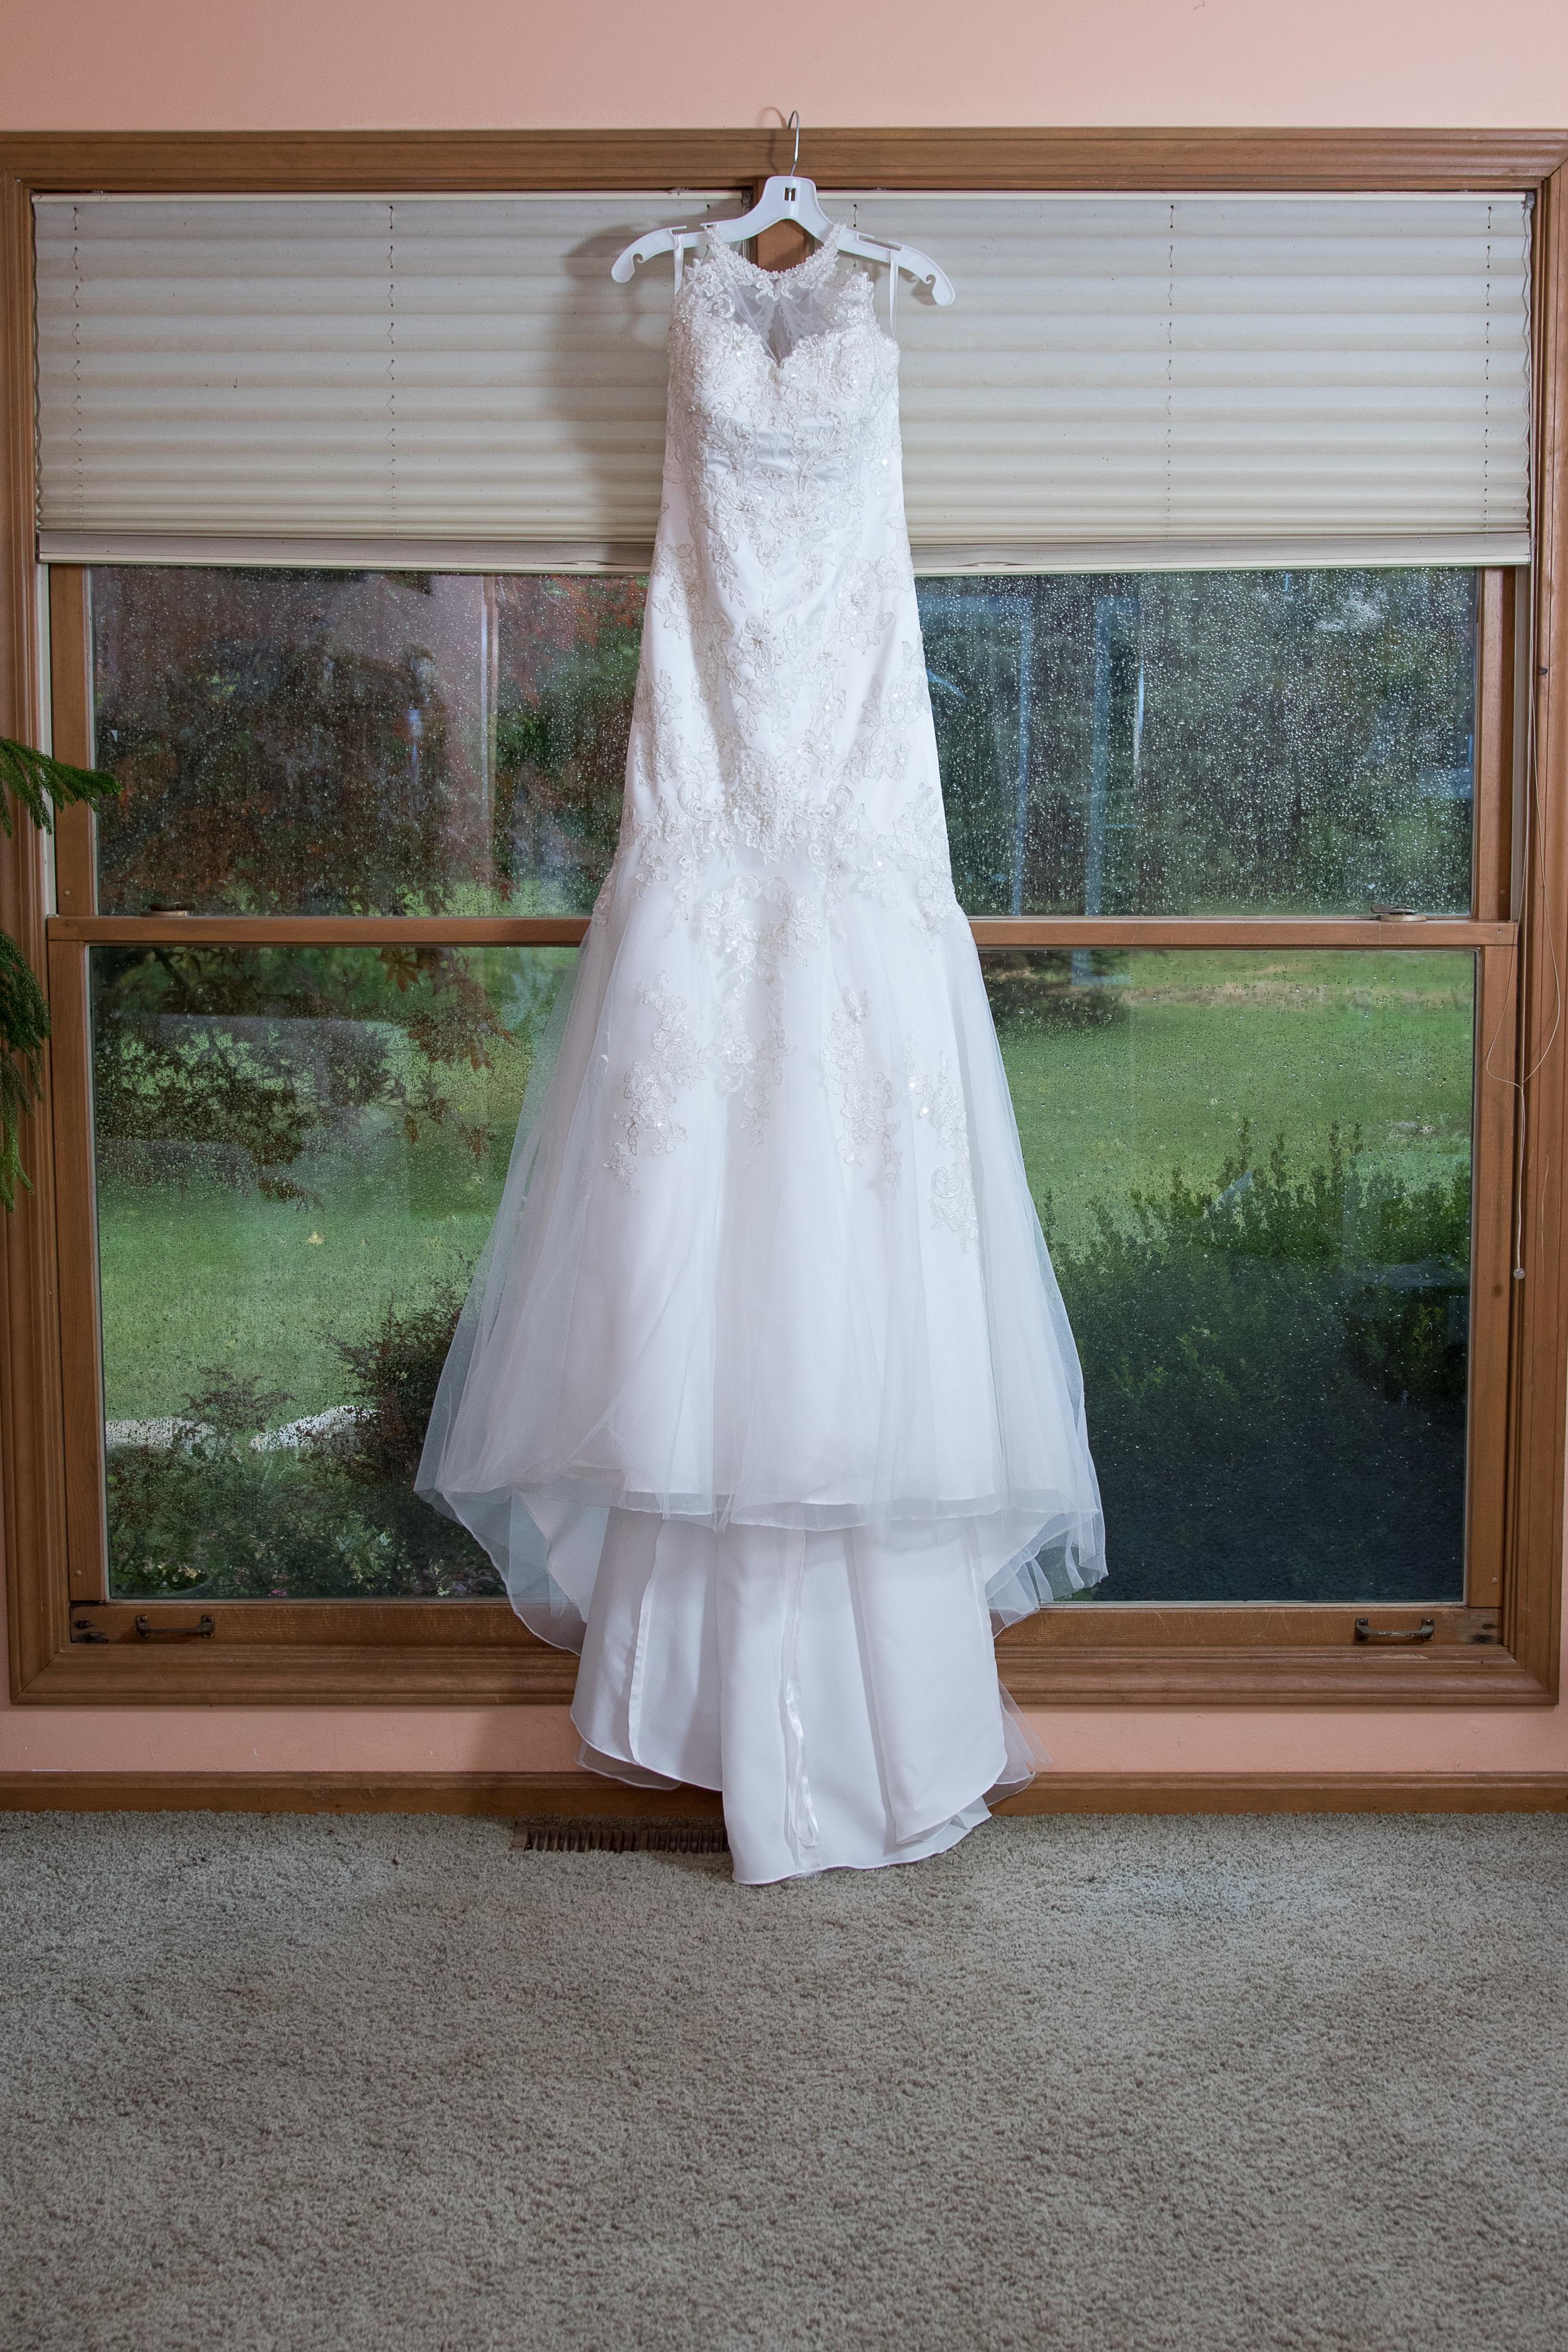 01-Wedding-Prep-021.JPG